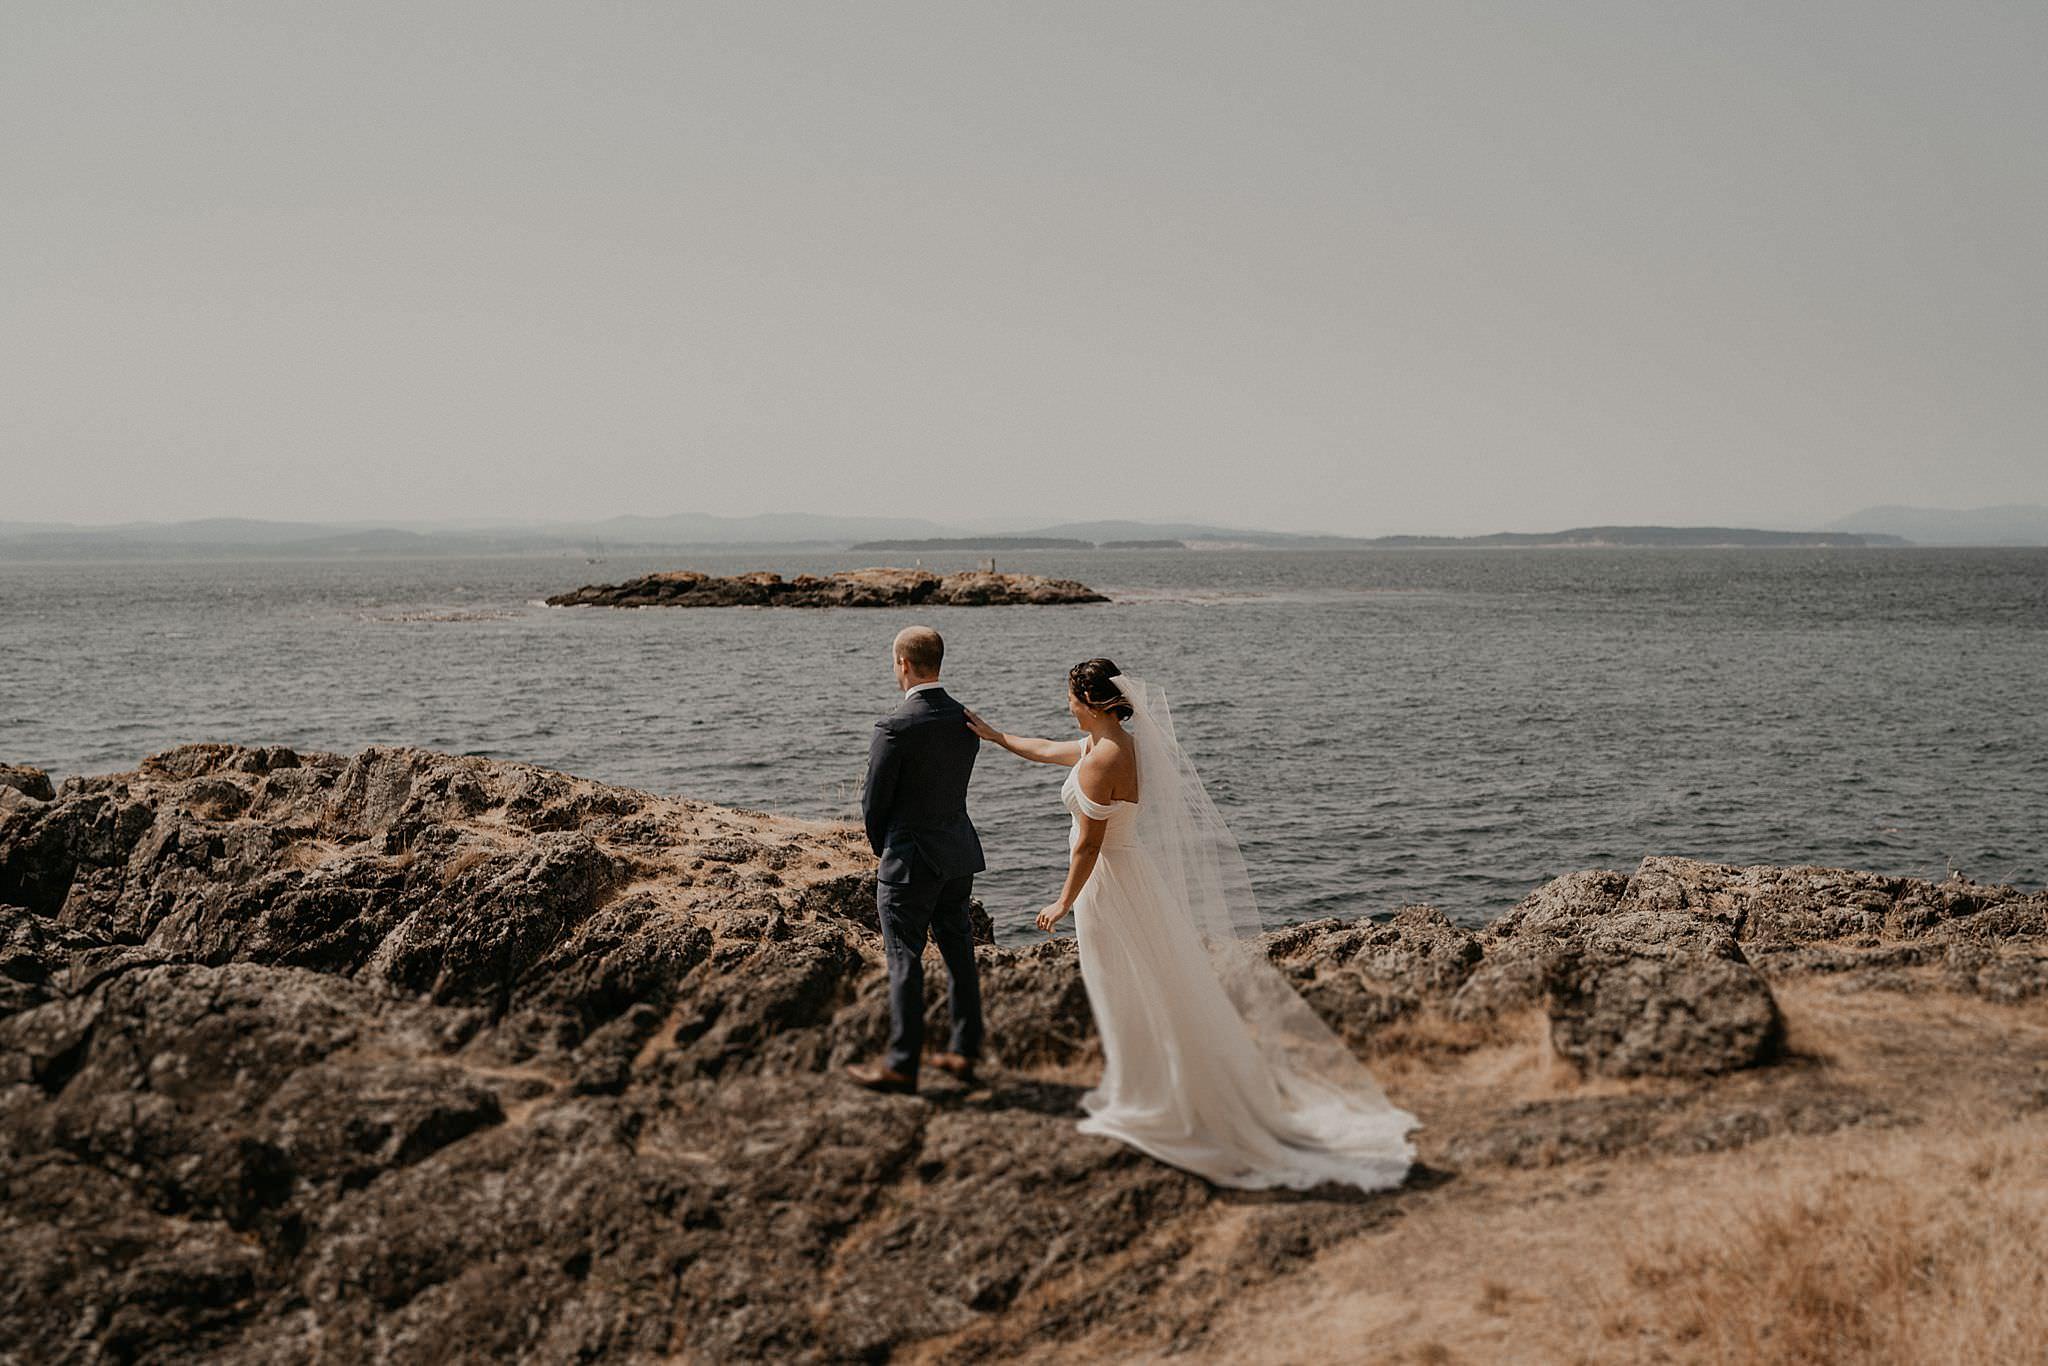 roche-harbor-wedding-san-juans-island-washington_0027.jpg